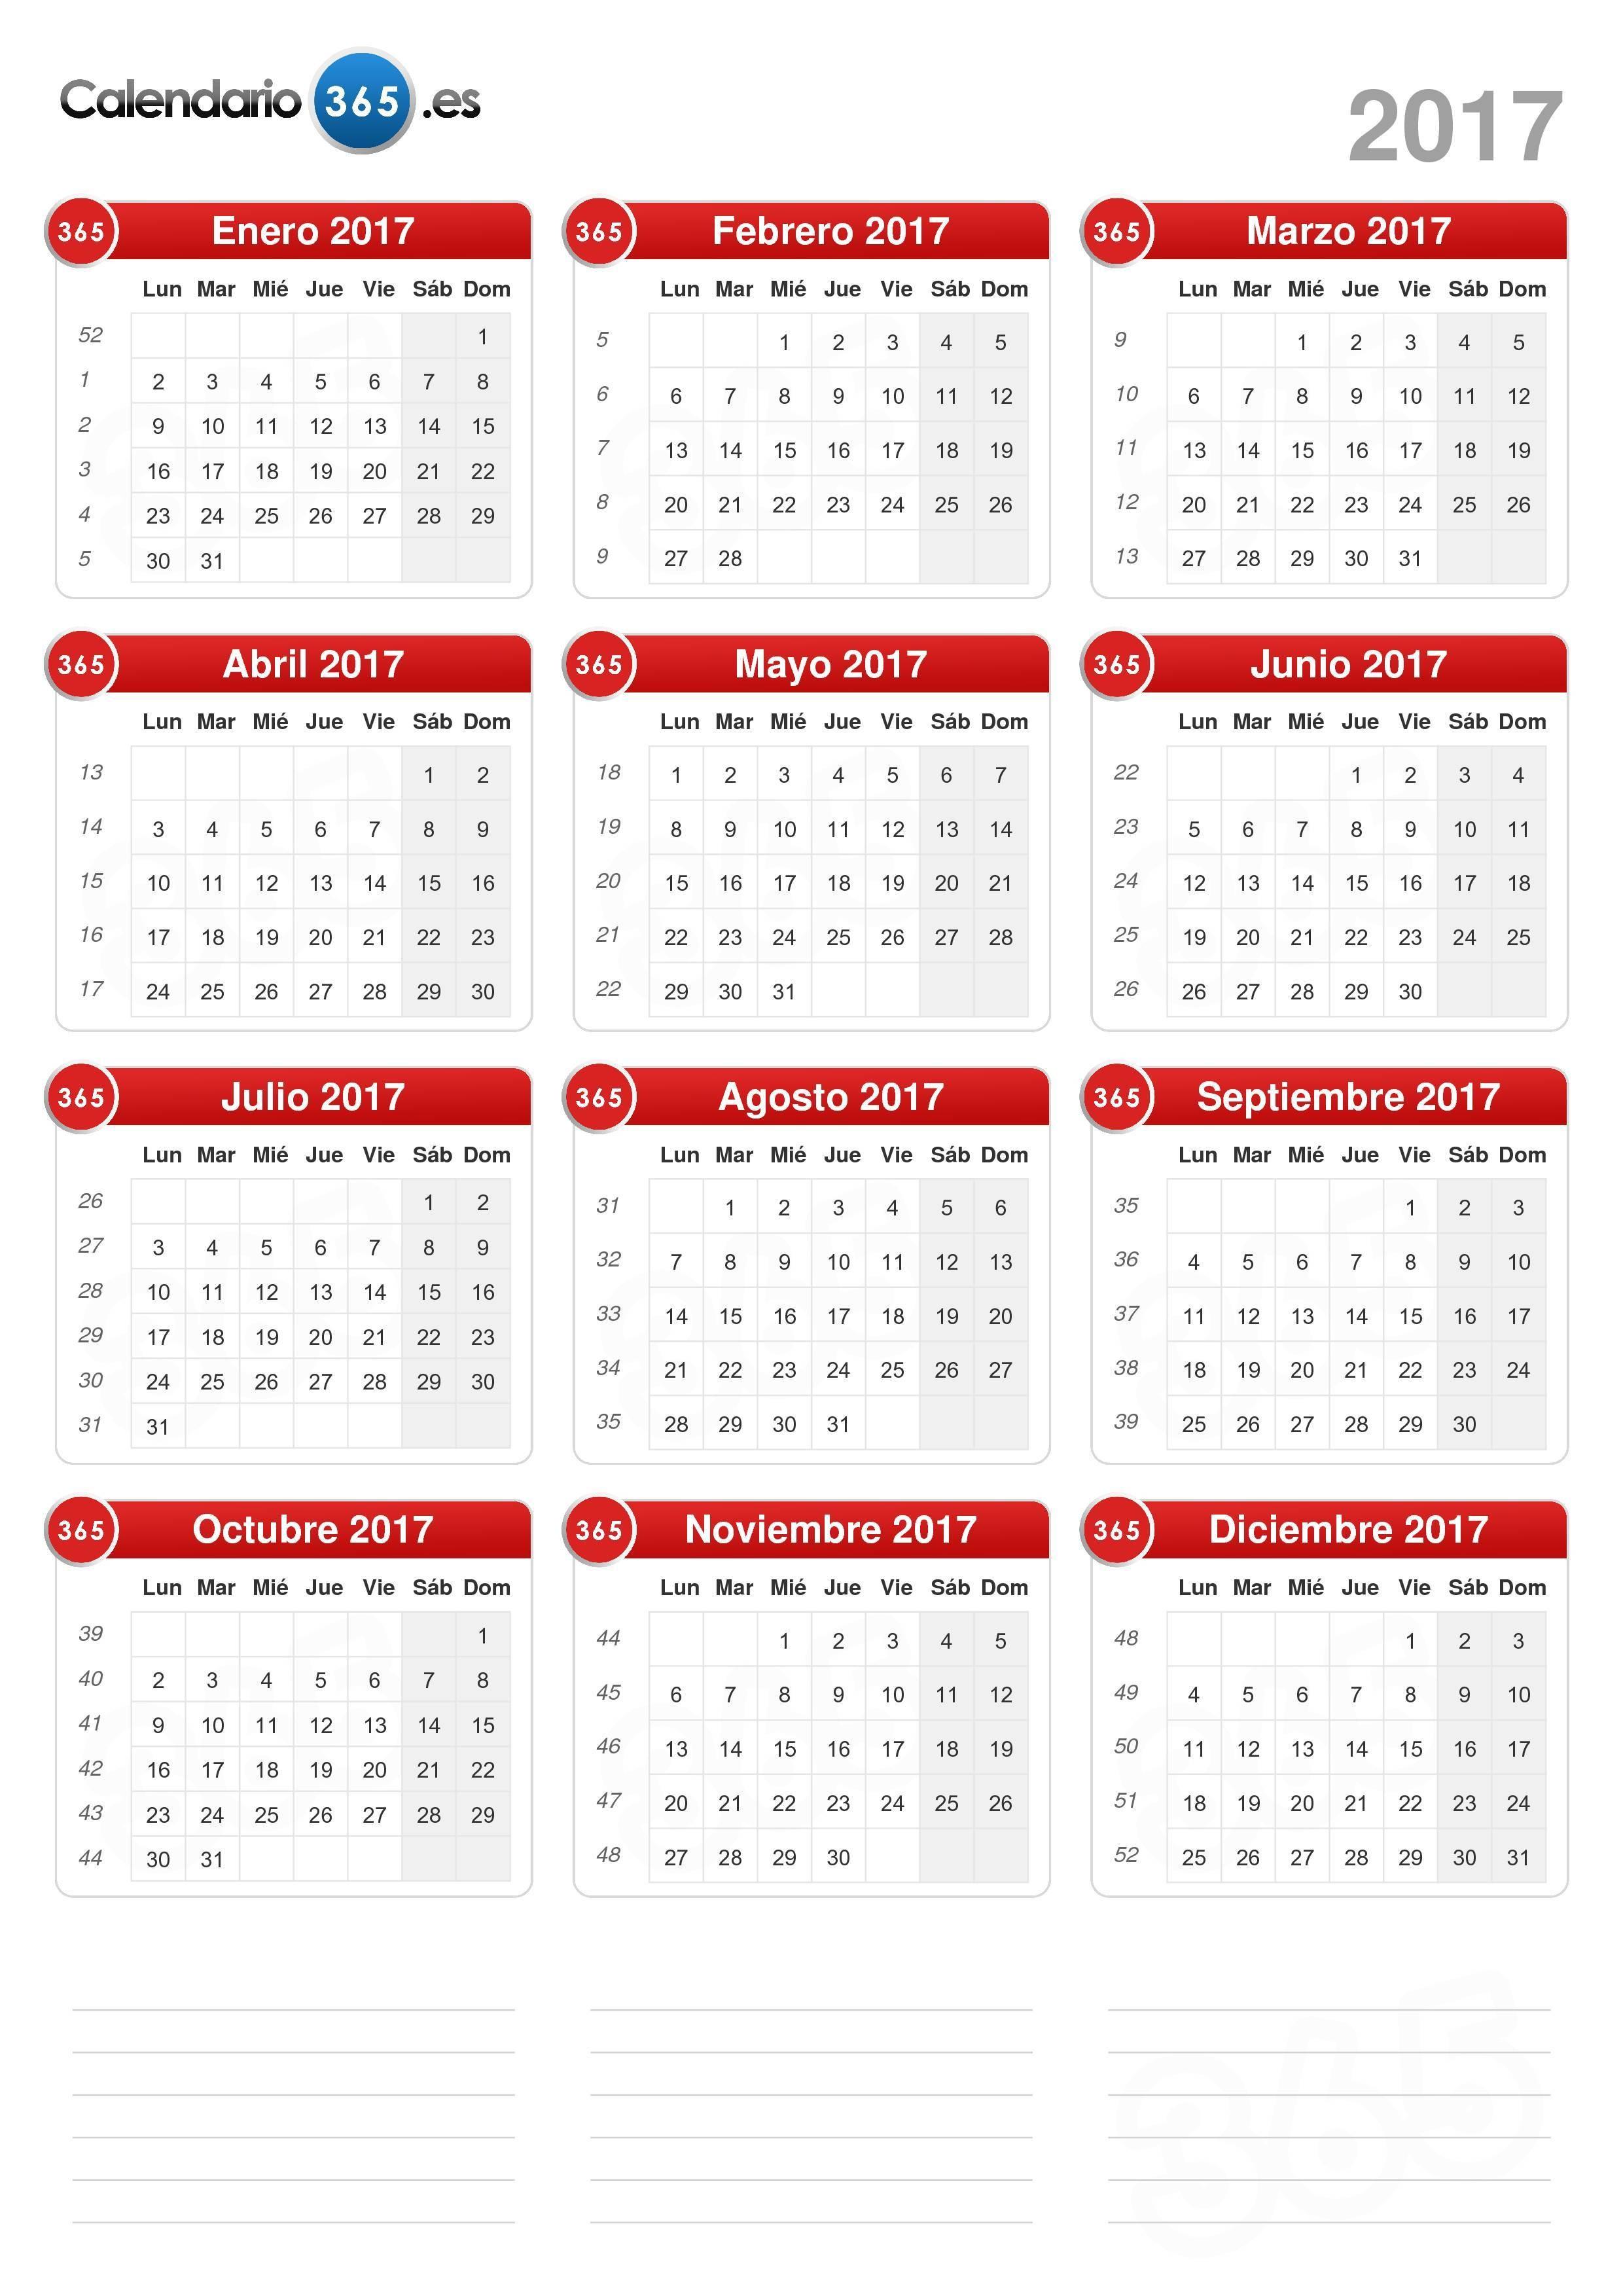 Calendario 2019 Semana Santa España Recientes Calendario 2017 Of Calendario 2019 Semana Santa España Actual Information to Users Pdf